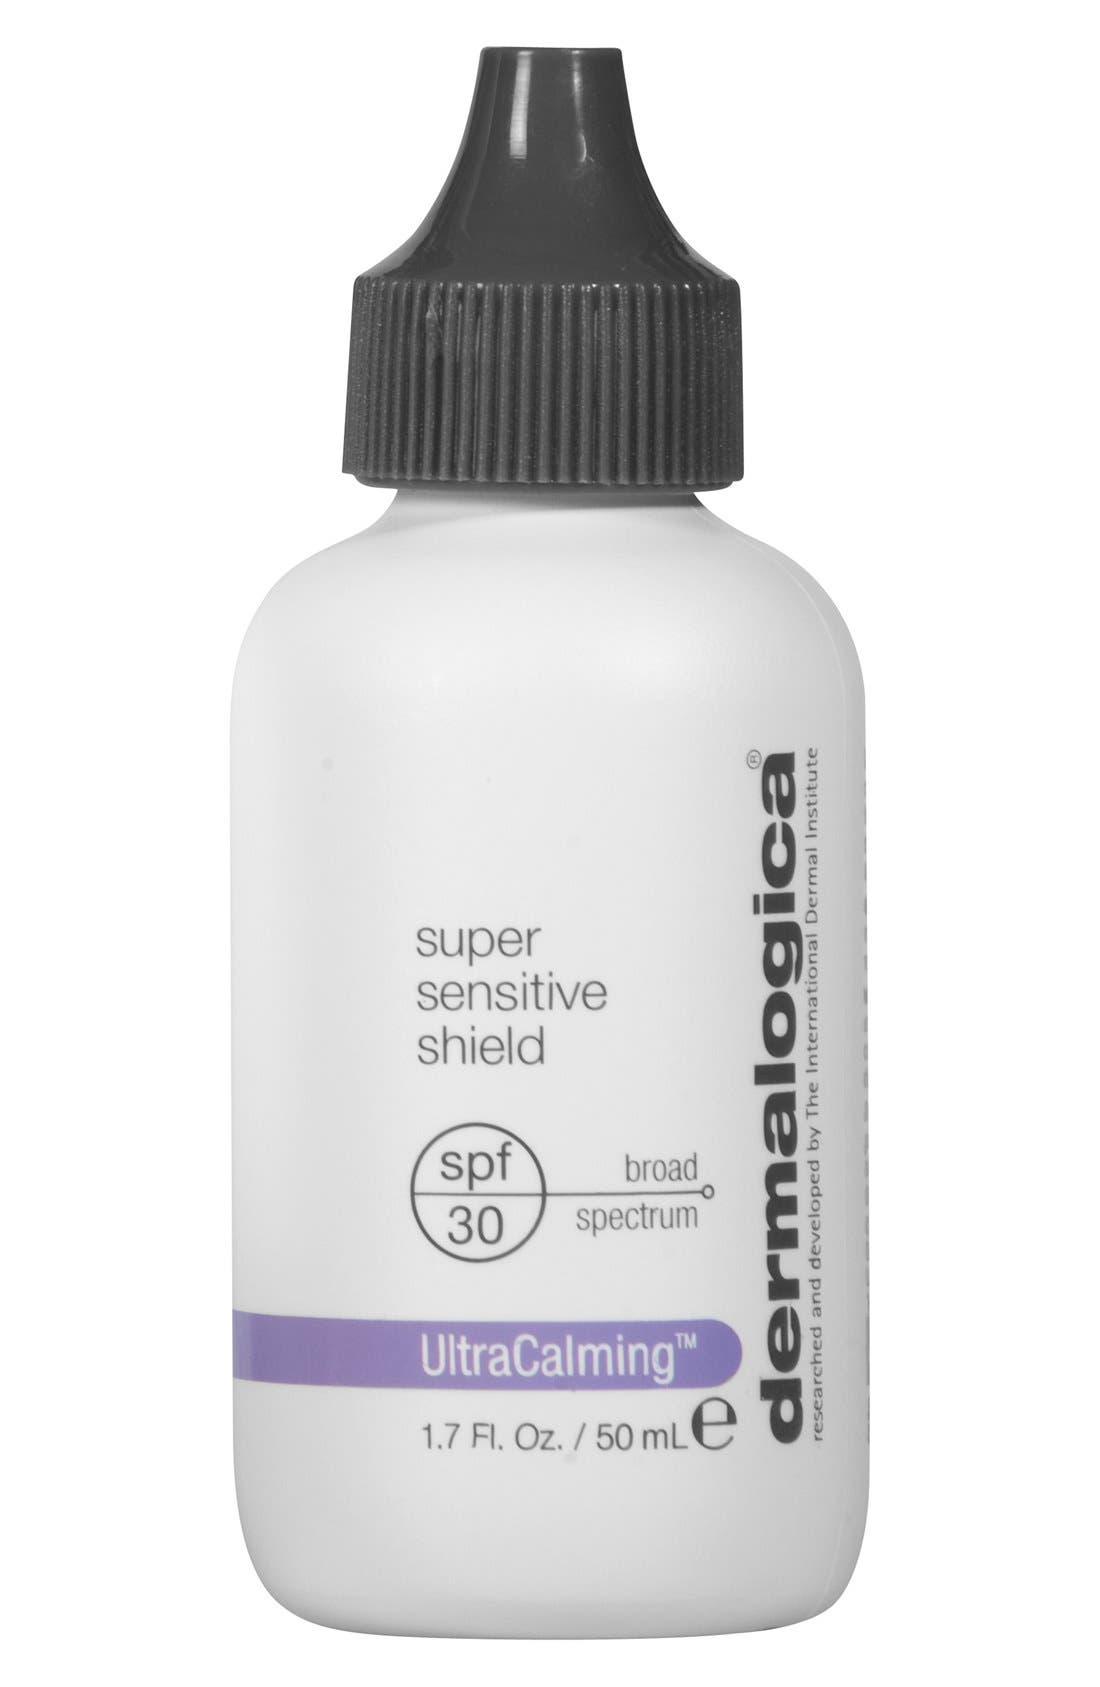 dermalogica® Super Sensitive Shield SPF 30